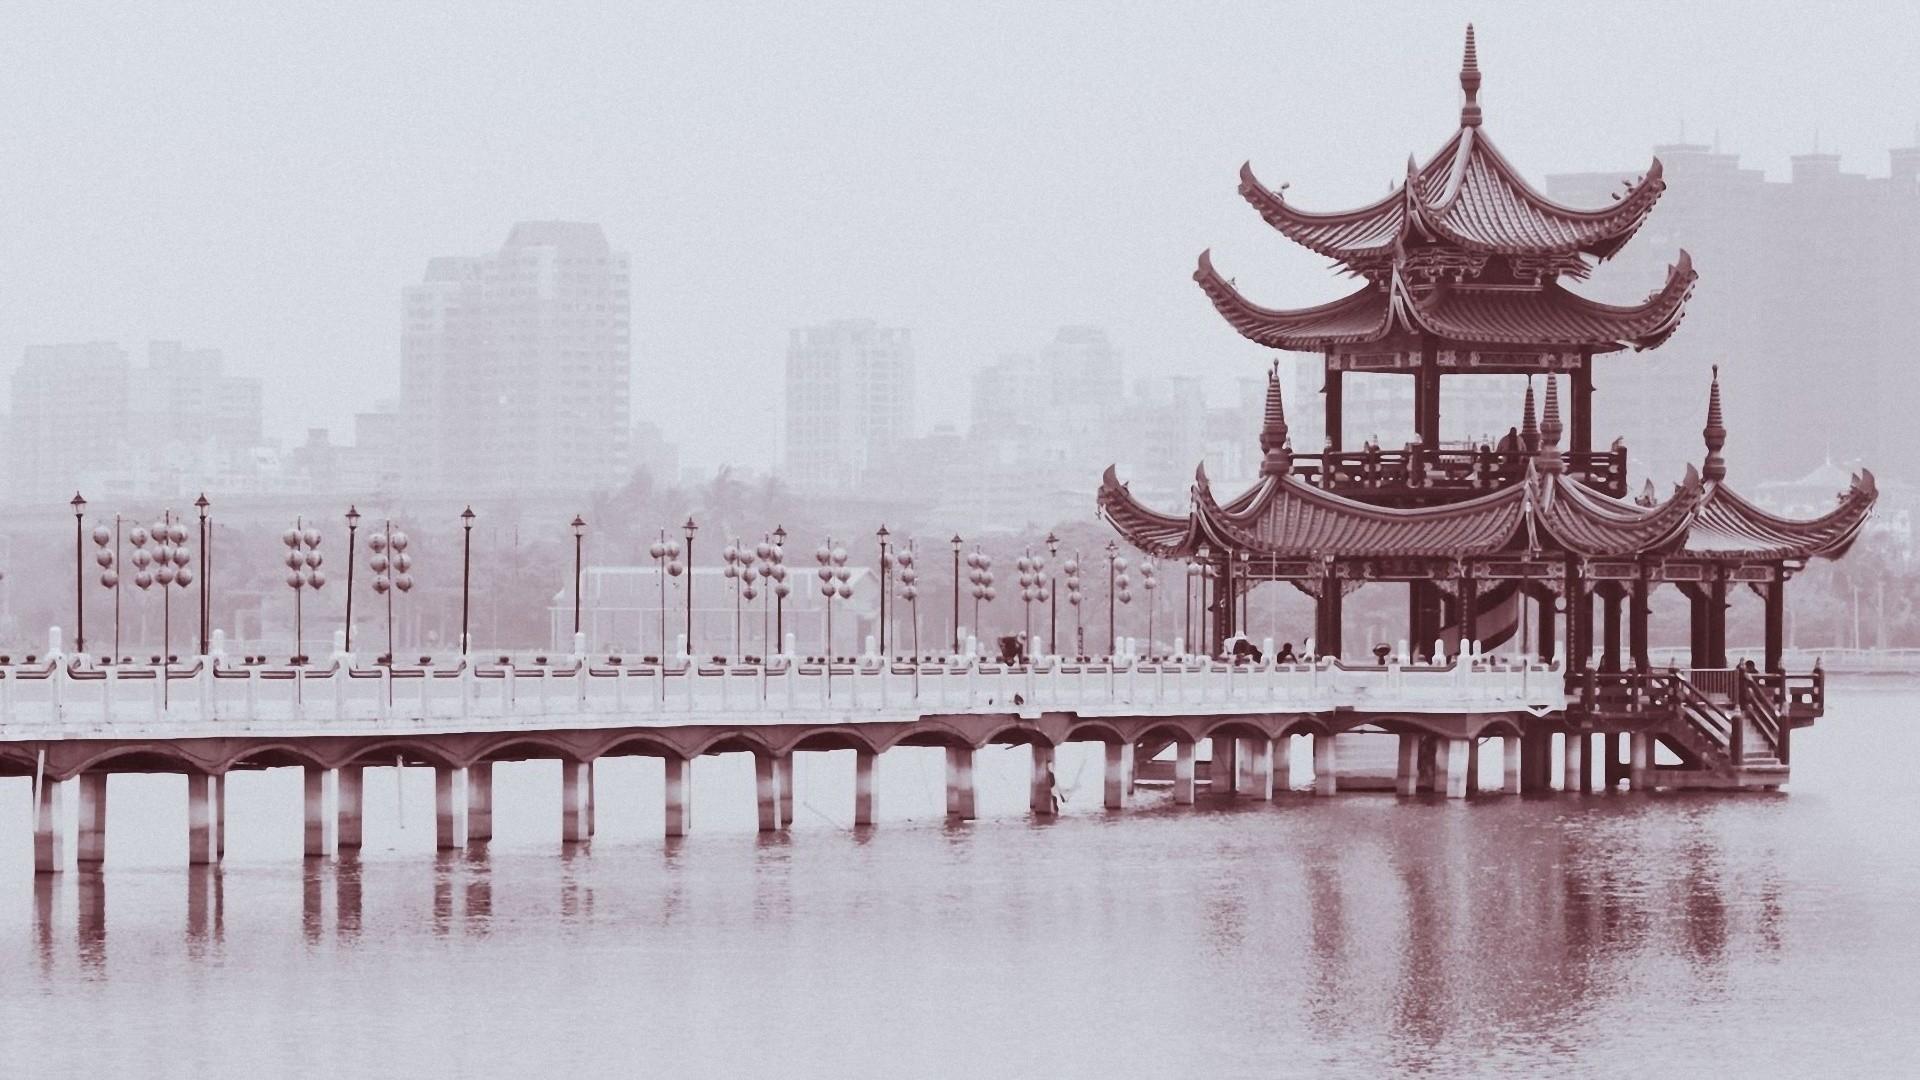 Res: 1920x1080, Chinese monochrome  wallpaper Design bridges buildings black white  wallpaper |  | 46098 | WallpaperUP